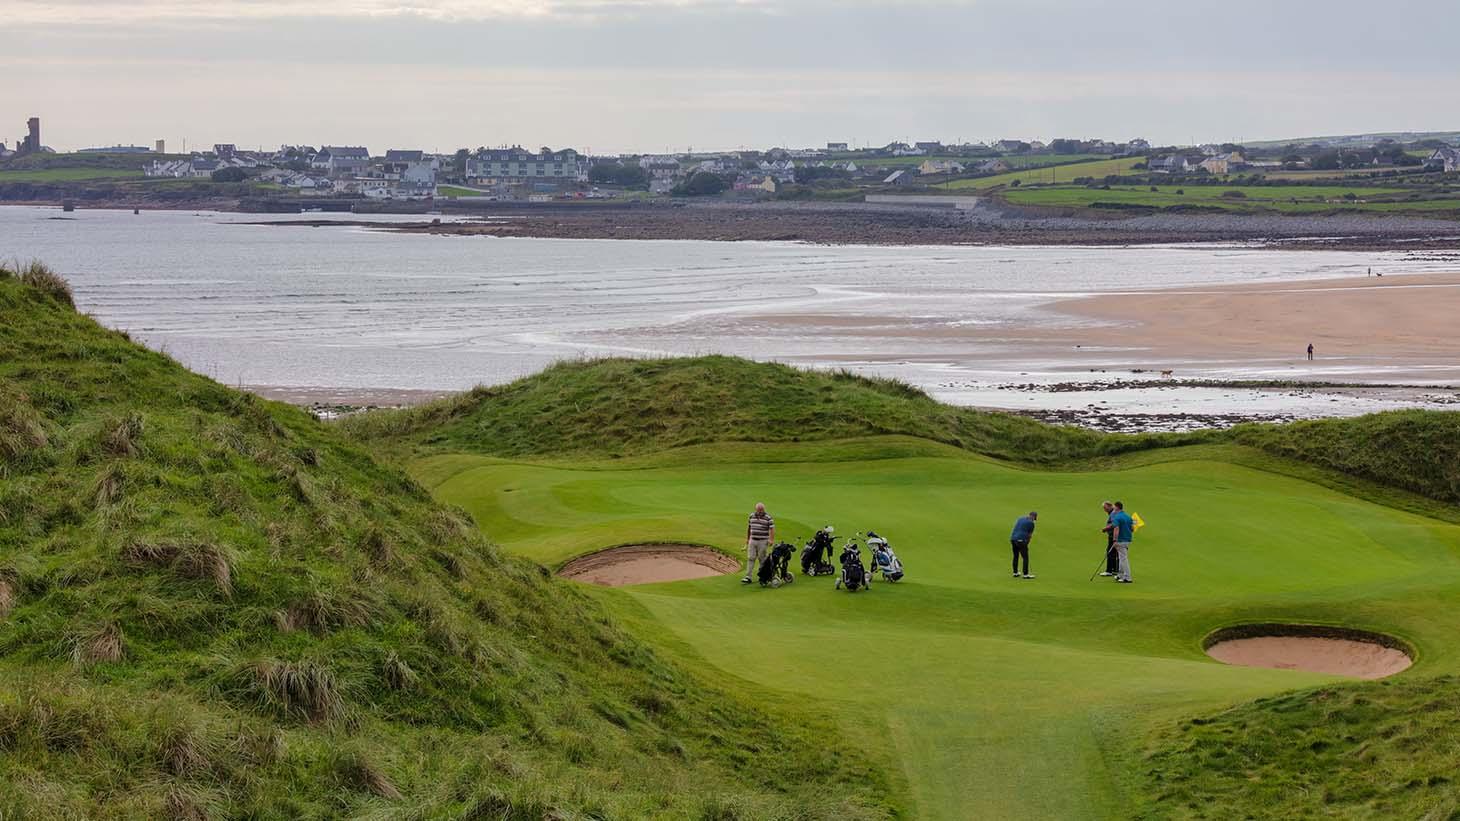 Lahinch Golf Club overlooking the Atlantic Ocean in County Clare